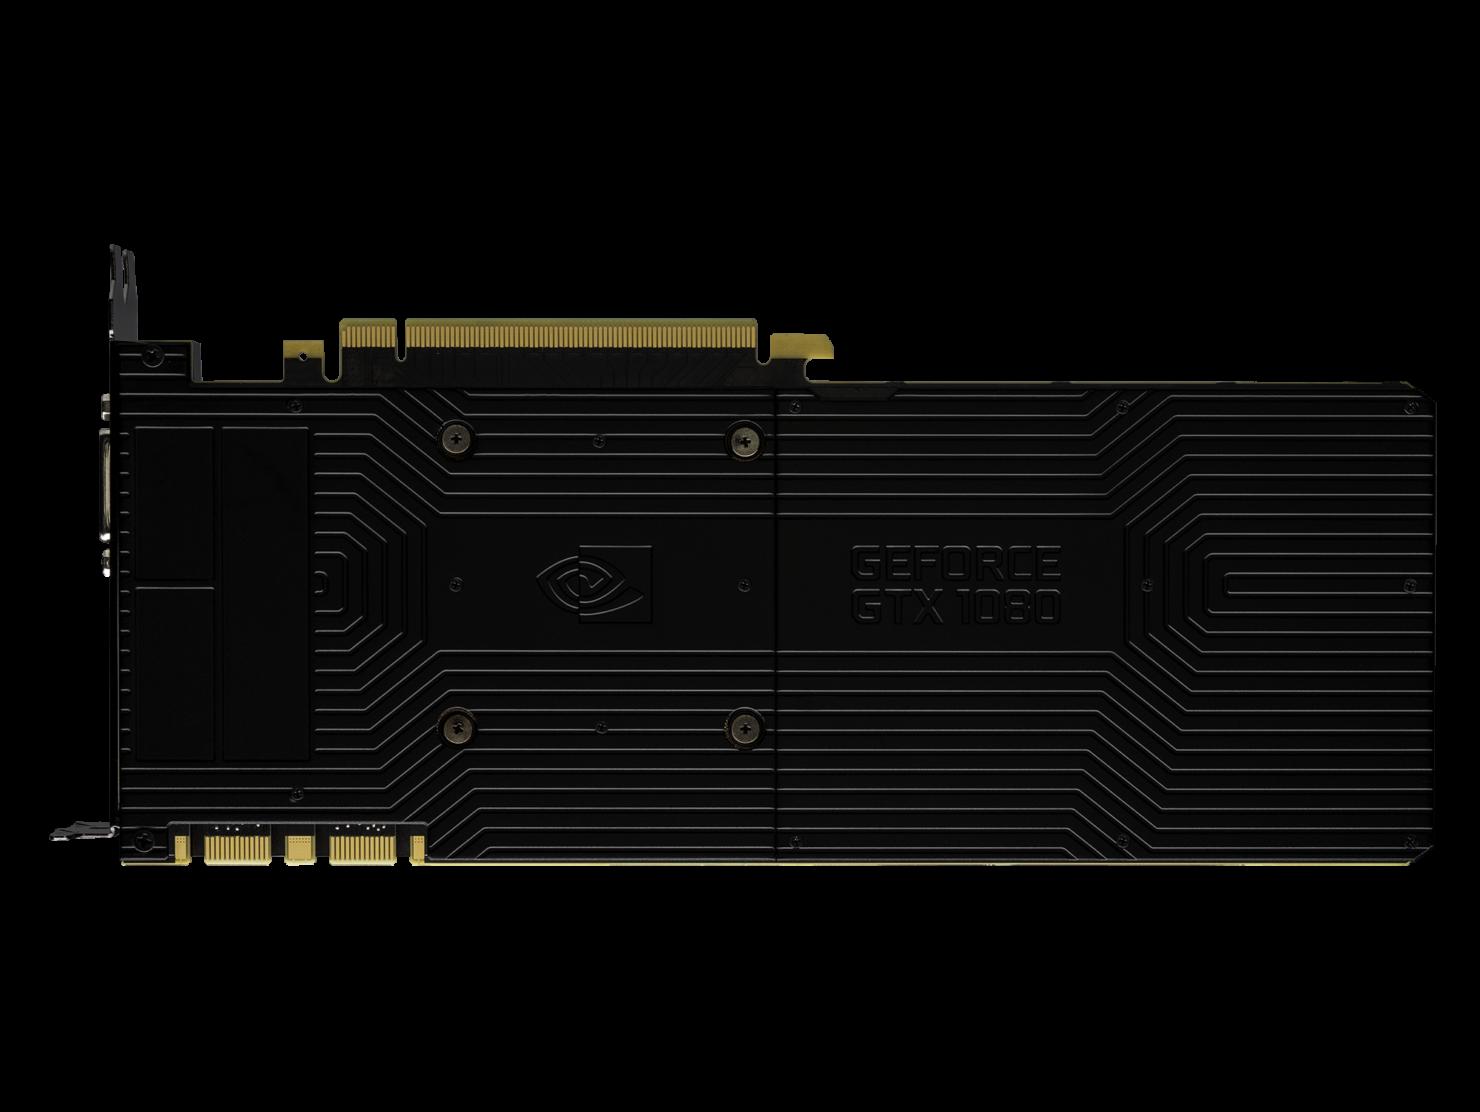 nvidia-geforce-gtx-1080-founders-edition_4